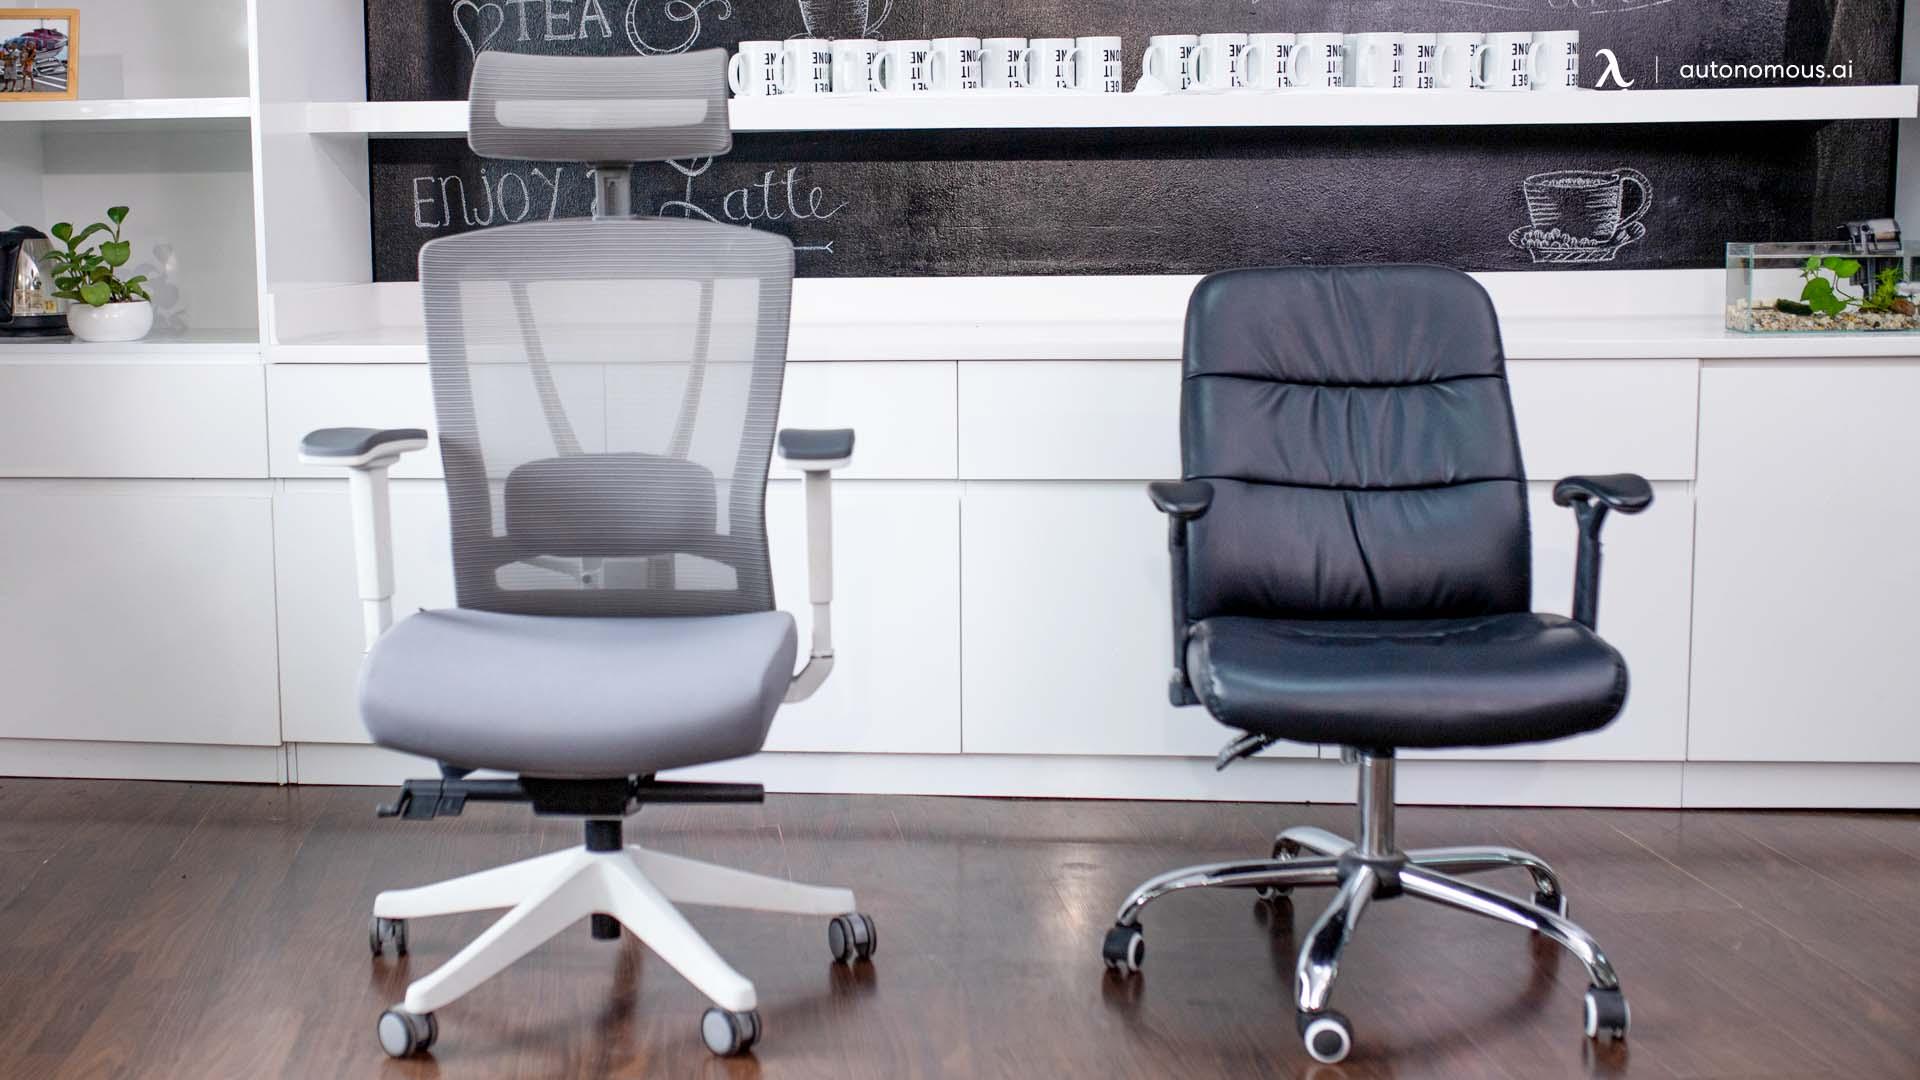 Is an Ergonomic Chair Worth It?